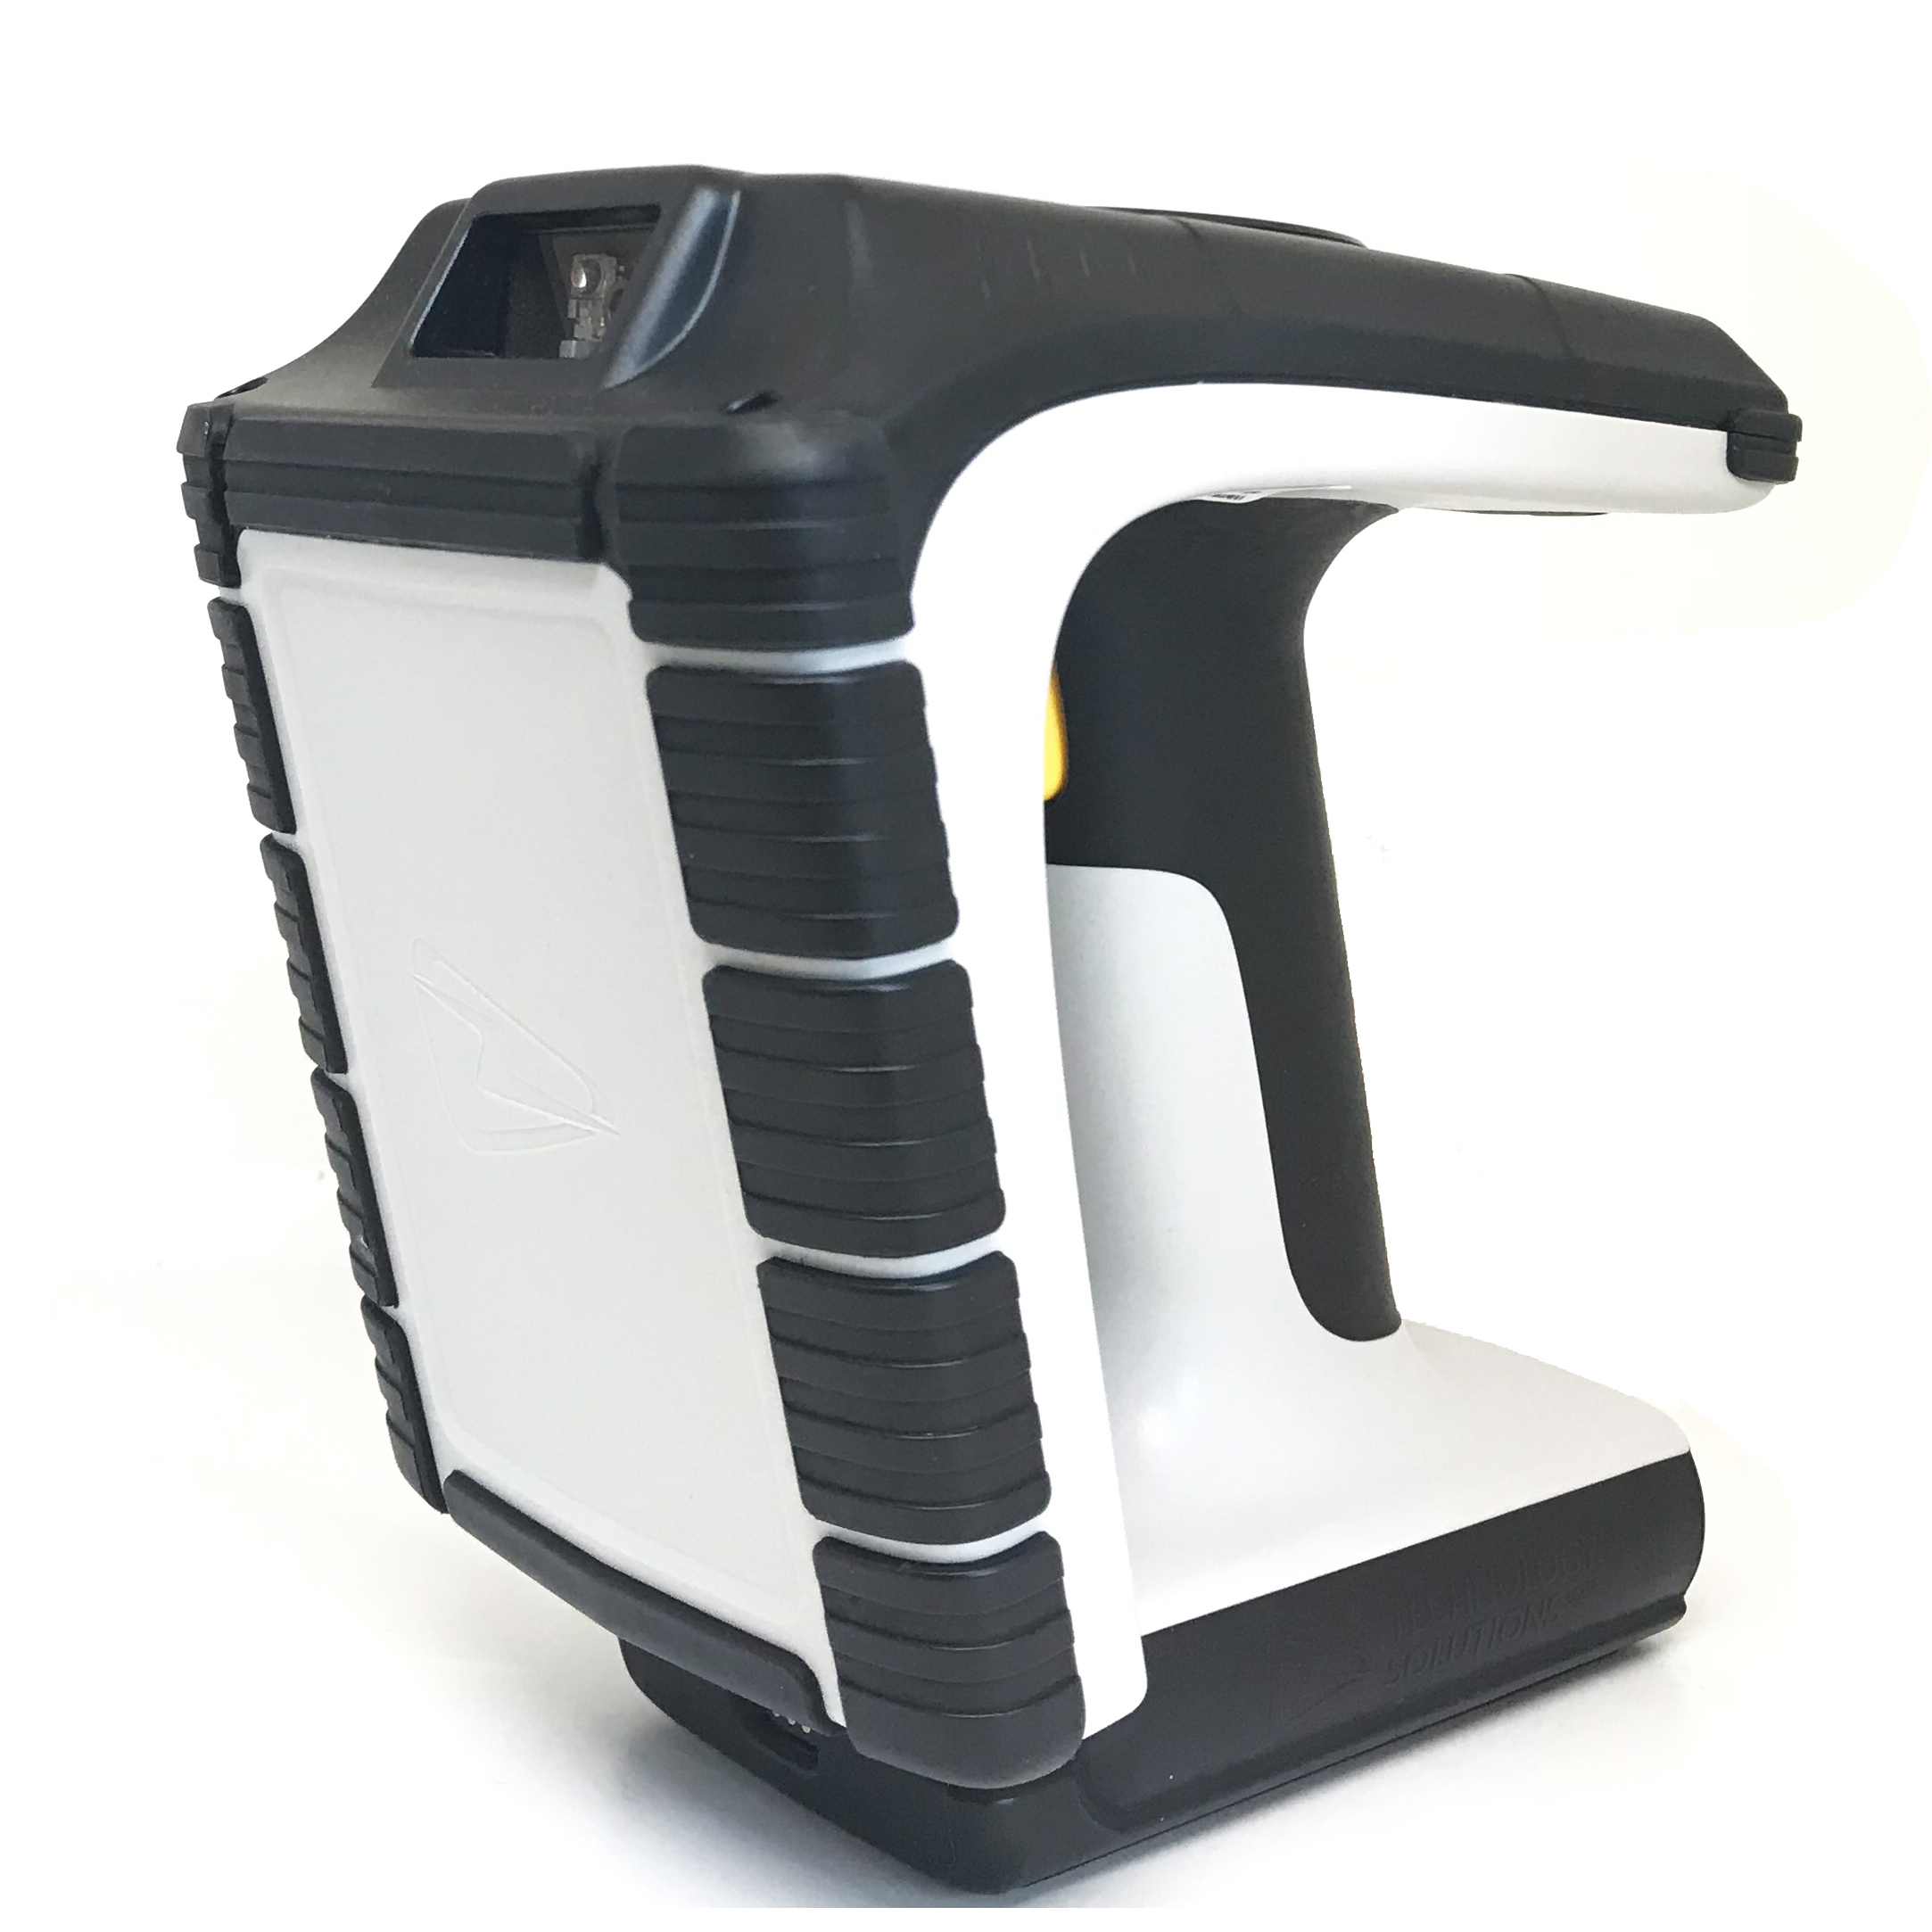 TSL 1166 Bluetooth UHF RFID Reader & Writer